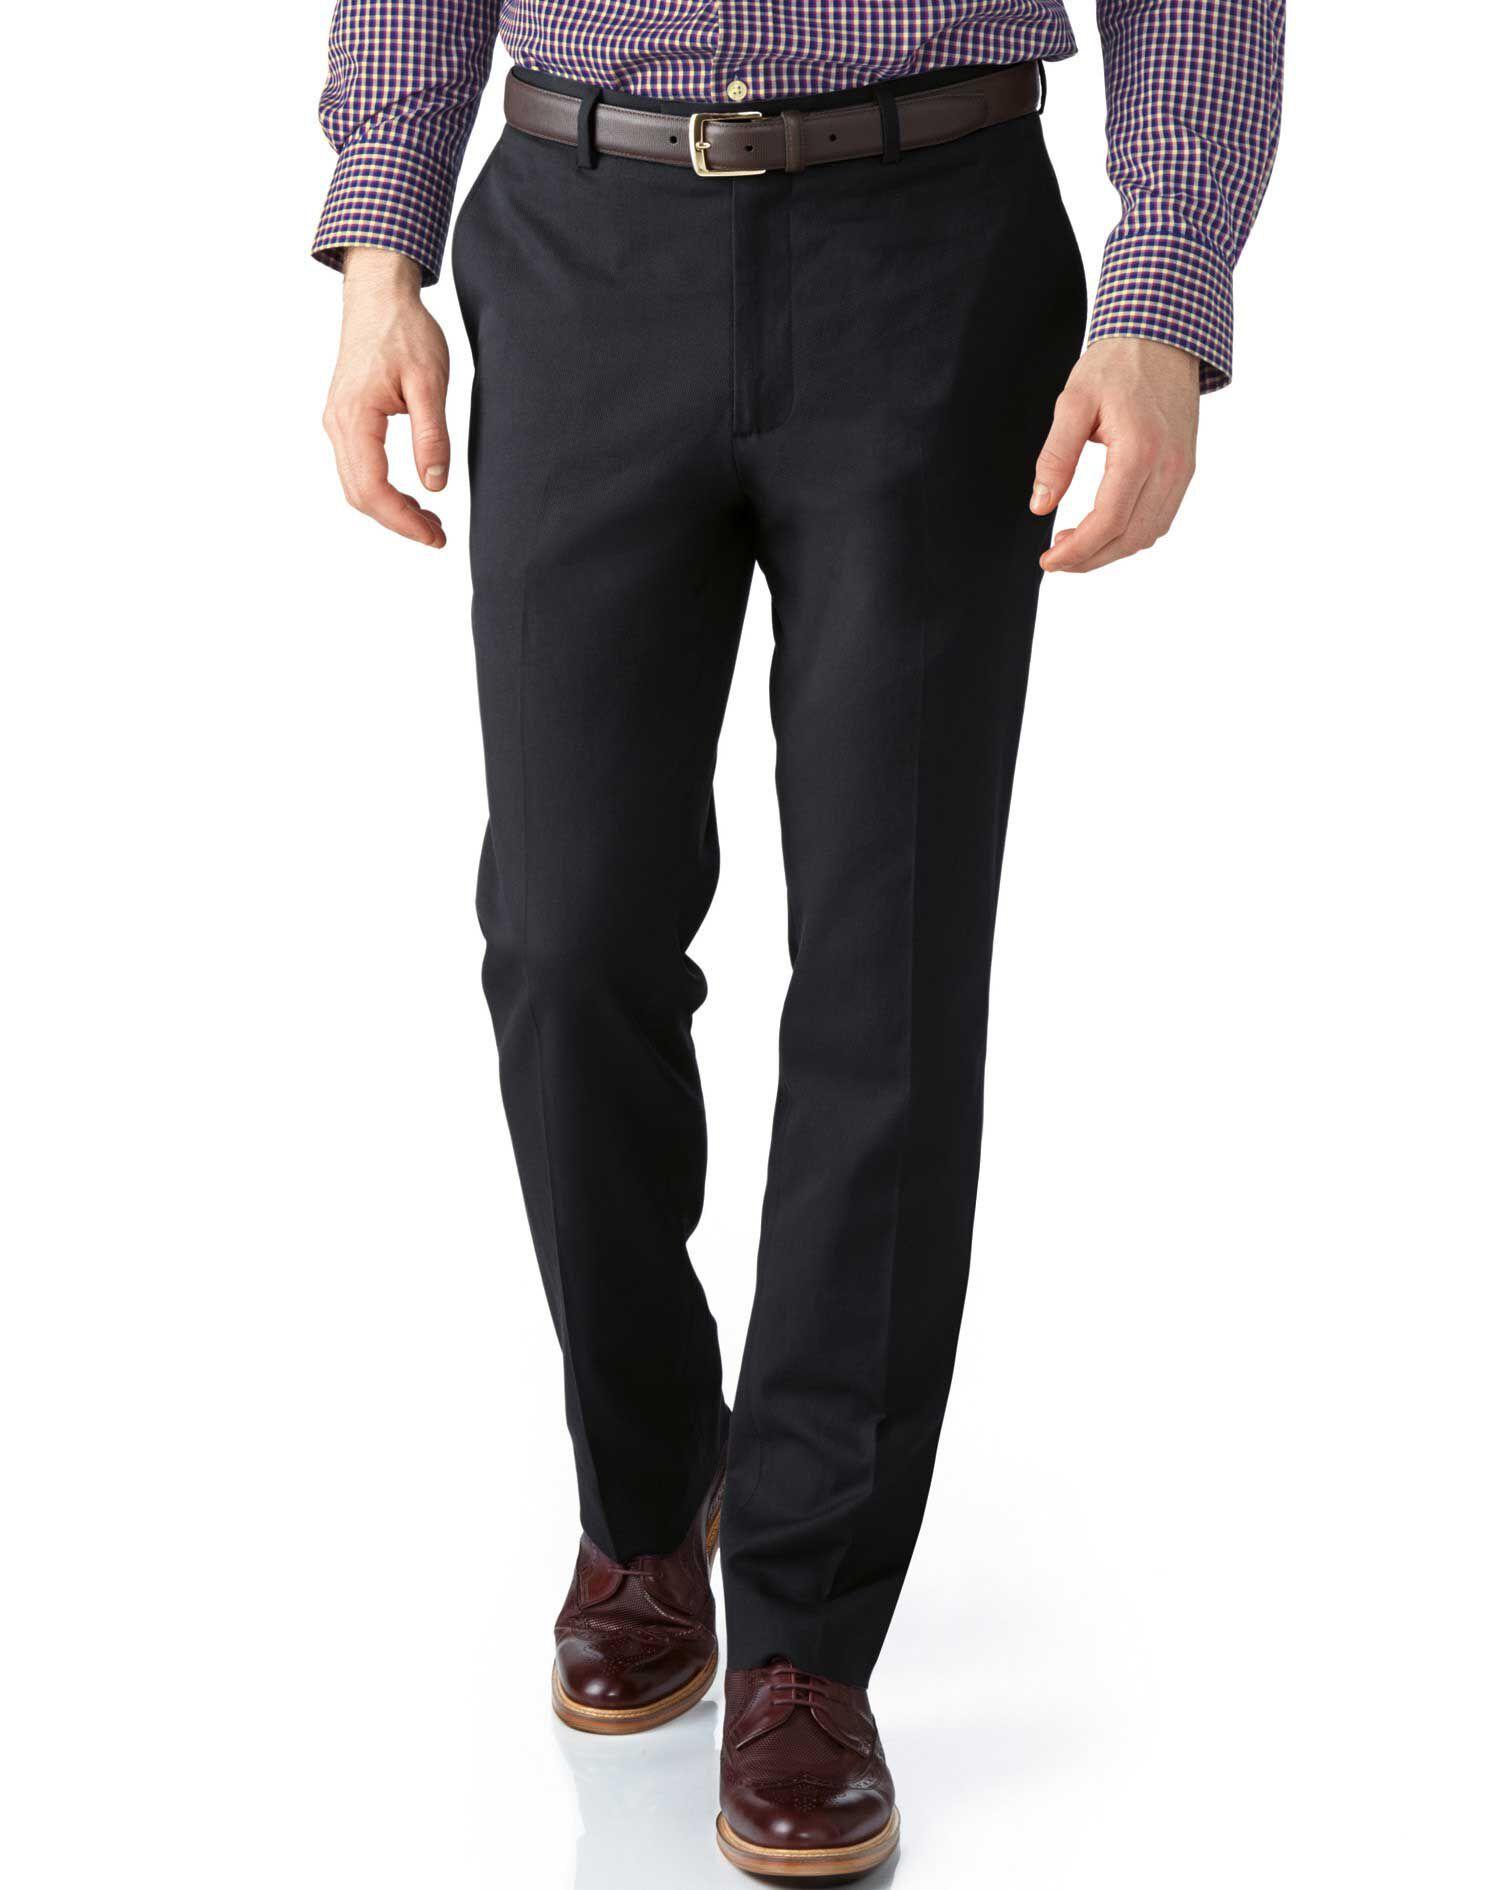 Grey Extra Slim Fit Stretch Cavalry Twill Trousers Size W38 L34 by Charles Tyrwhitt